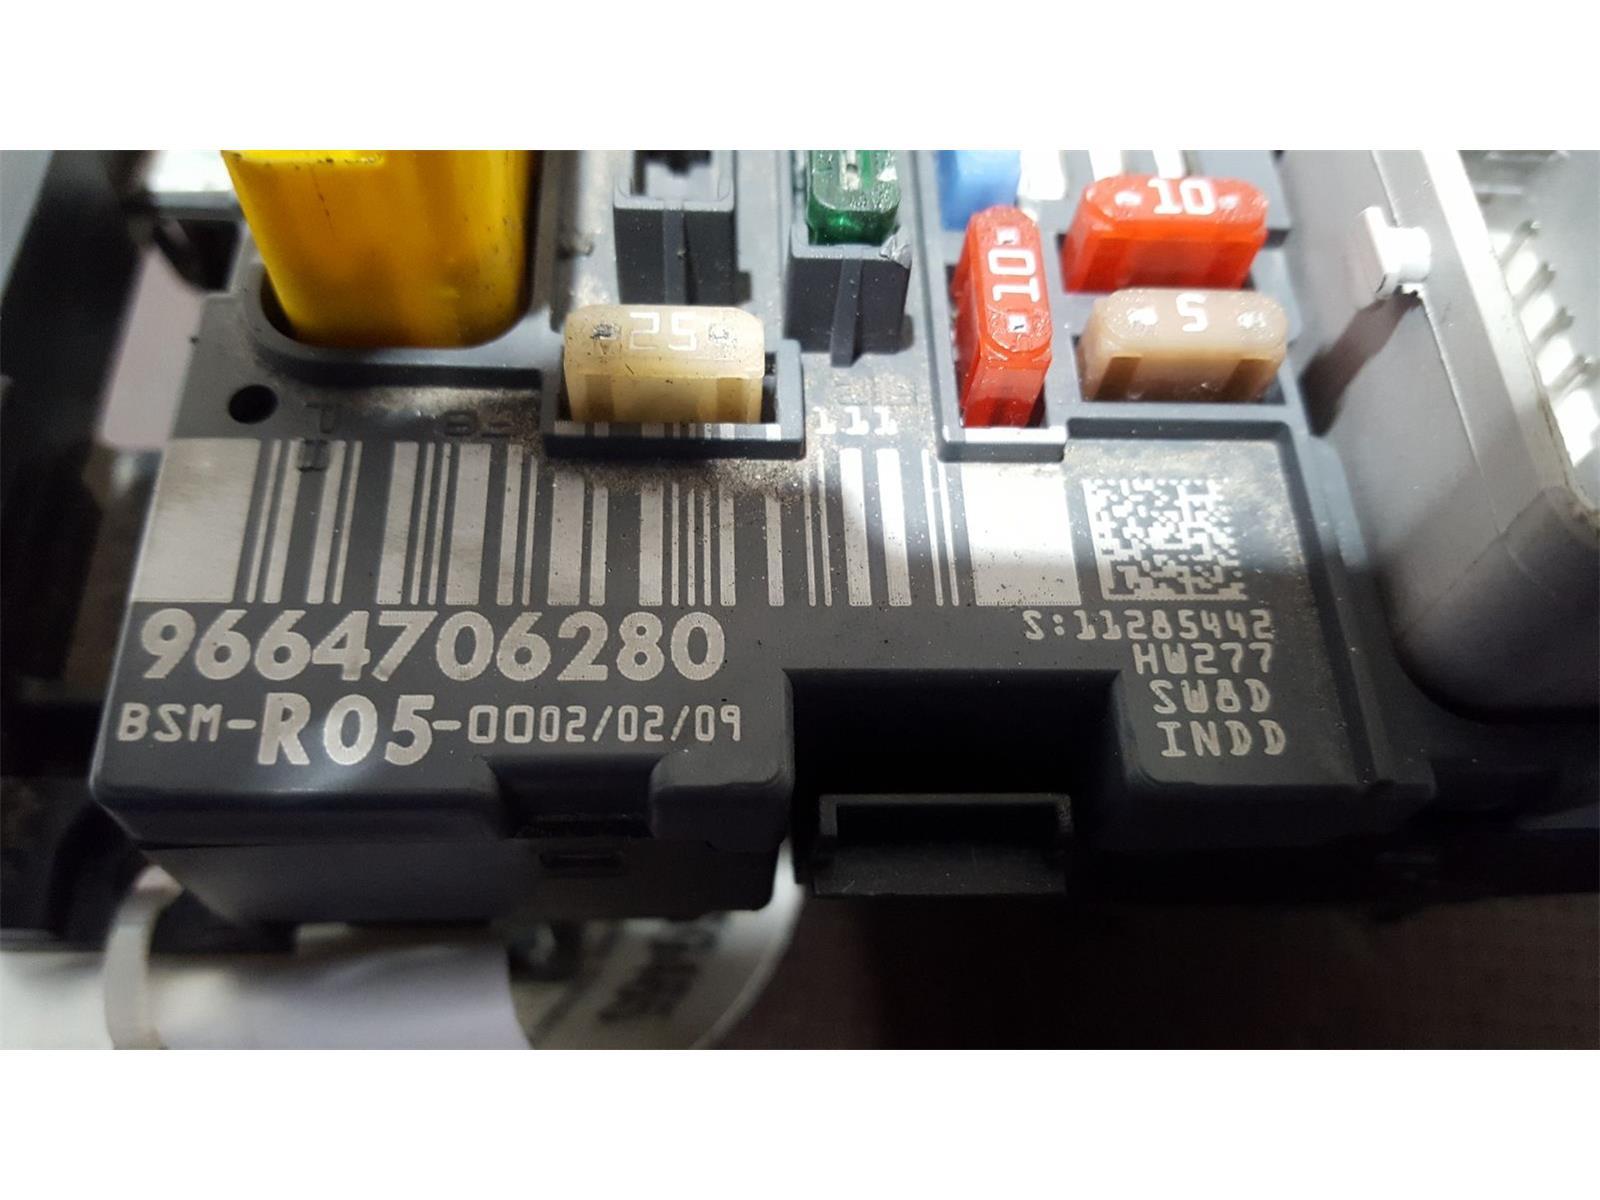 Citroen C1 Fuse Box Location Wiring Harness Wiring Diagram